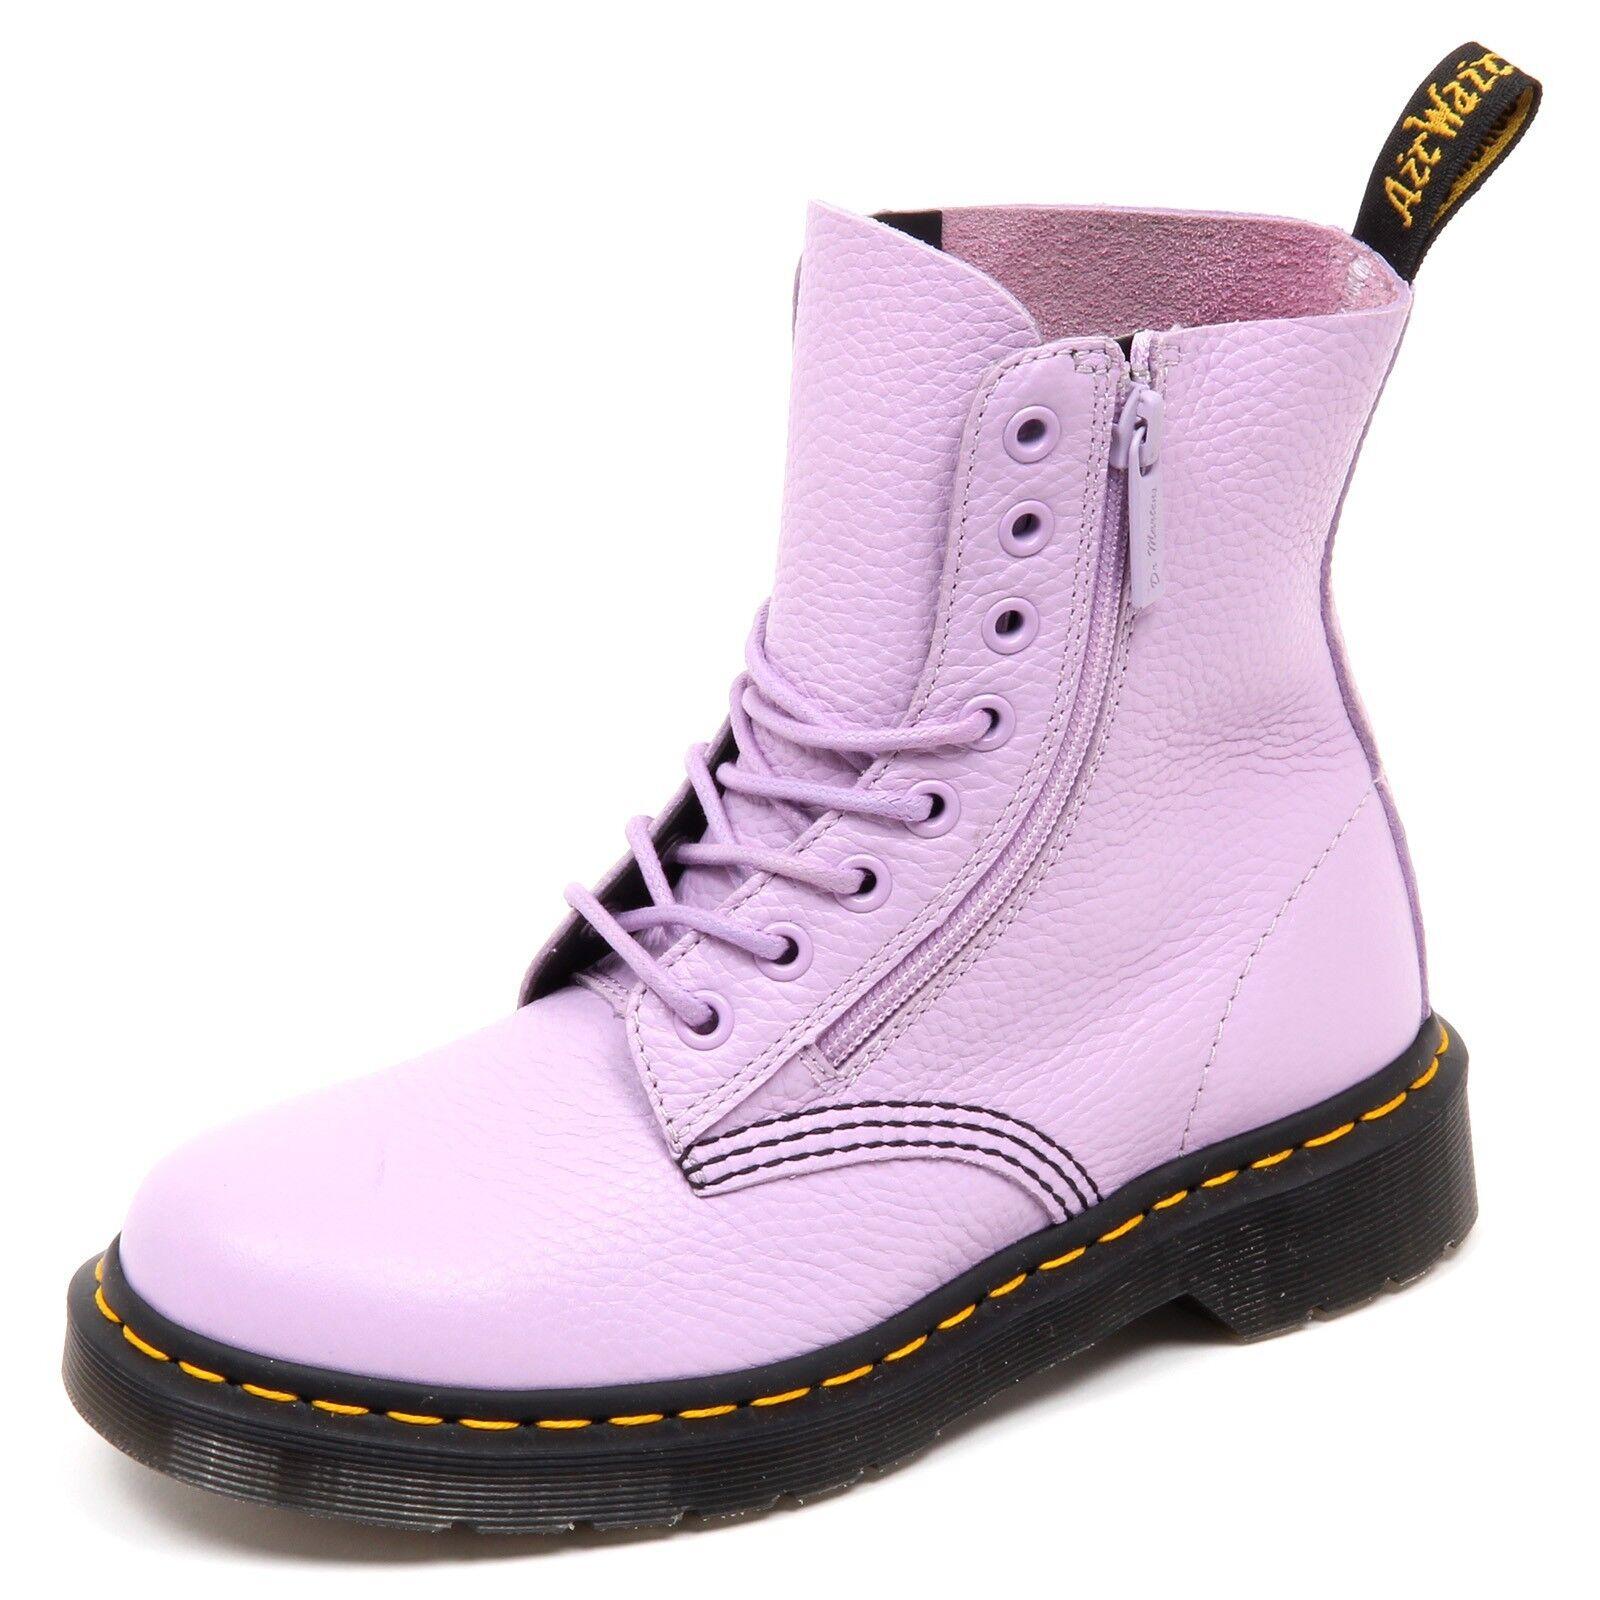 Grandes zapatos con descuento D6724 (without box) anfibio donna lilla DR. MARTENS PASCAL boot shoe woman